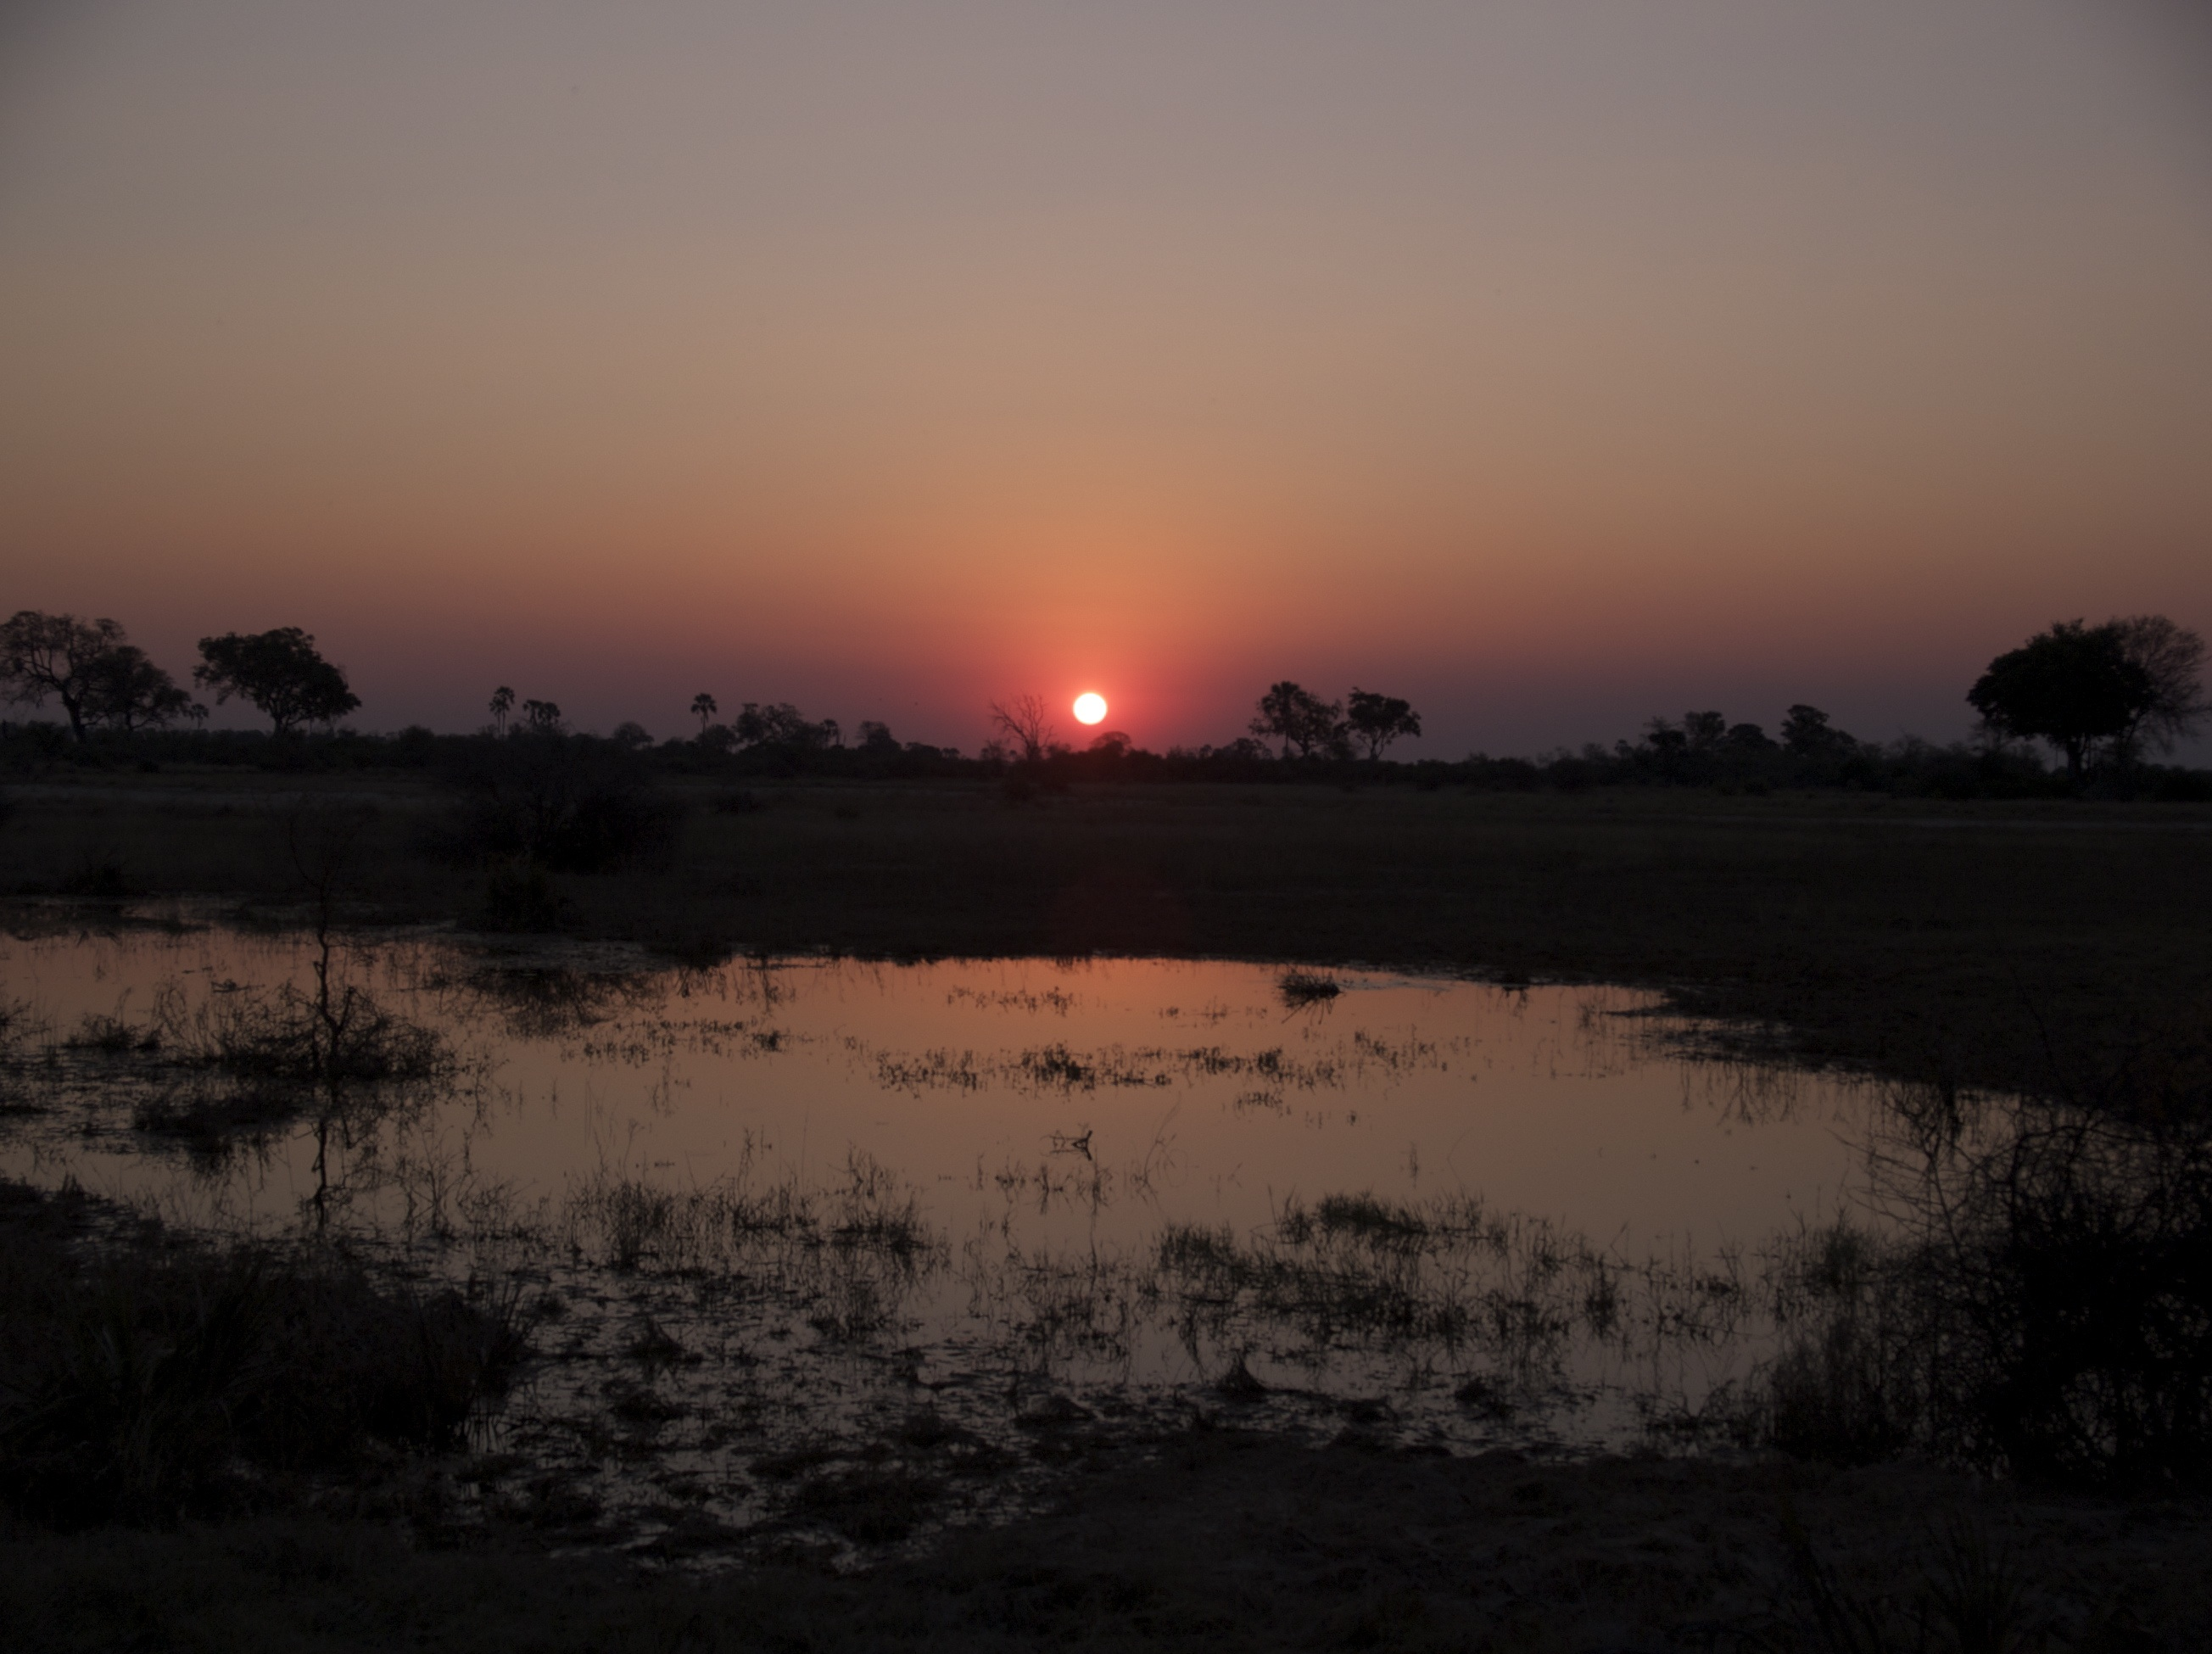 sunset tubu tree 1